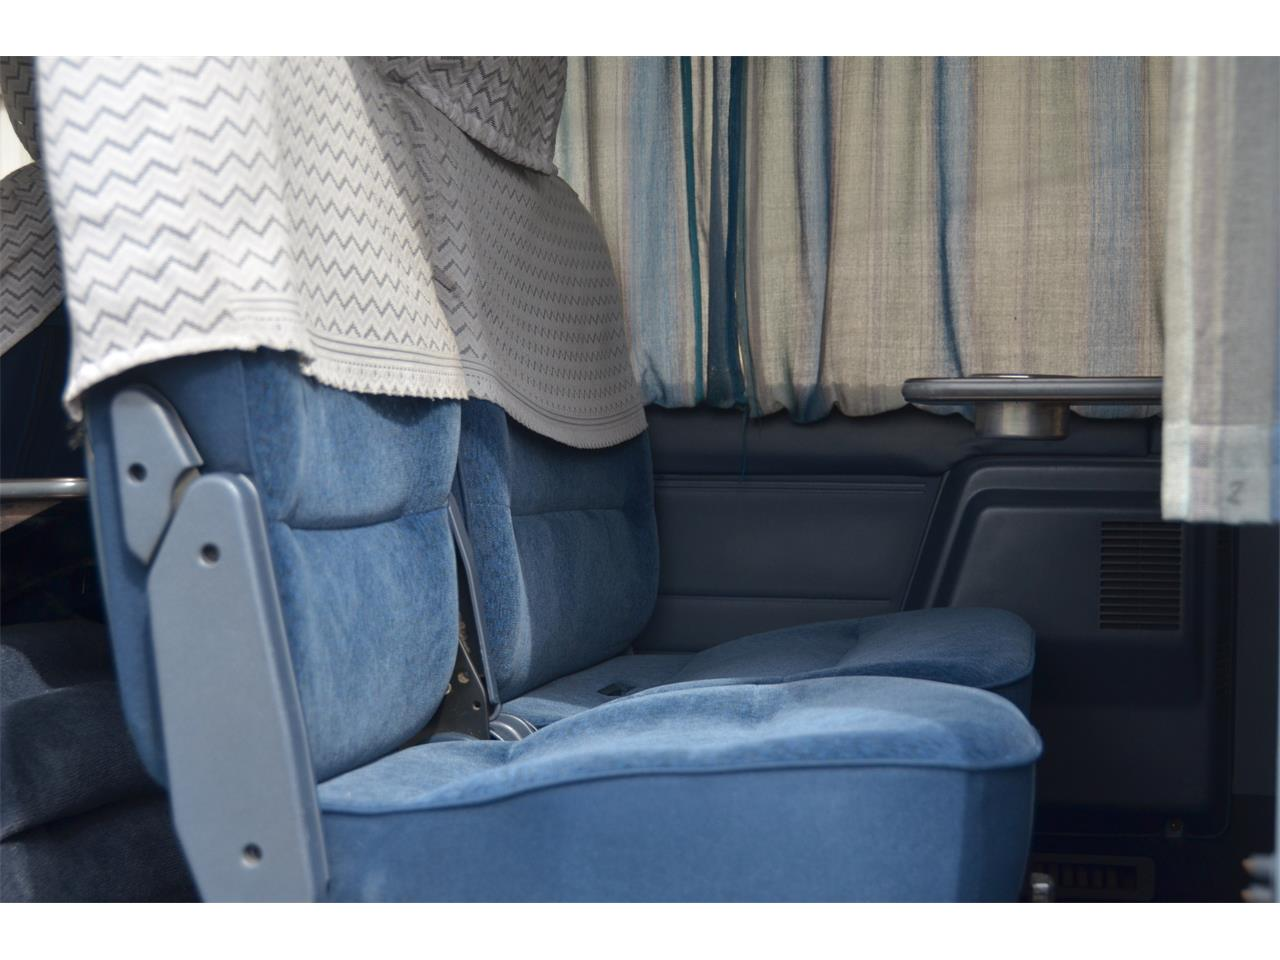 Large Picture of '90 Caravan located in Virginia - $17,900.00 - LN58